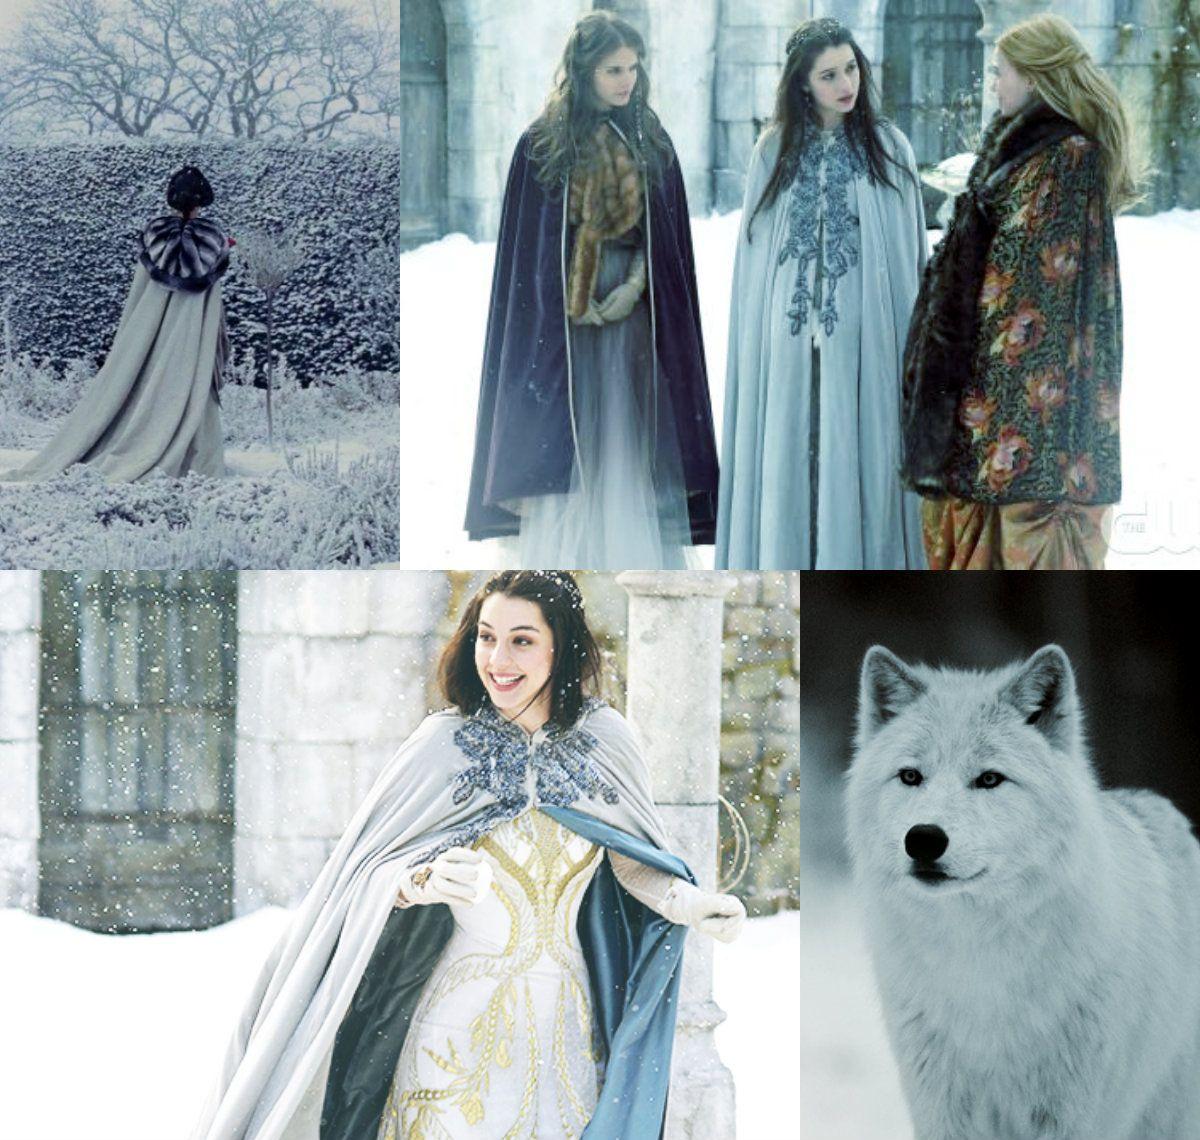 Wedding Hairstyles Games: Game Of Thrones - Lyanna Stark In Winterfell